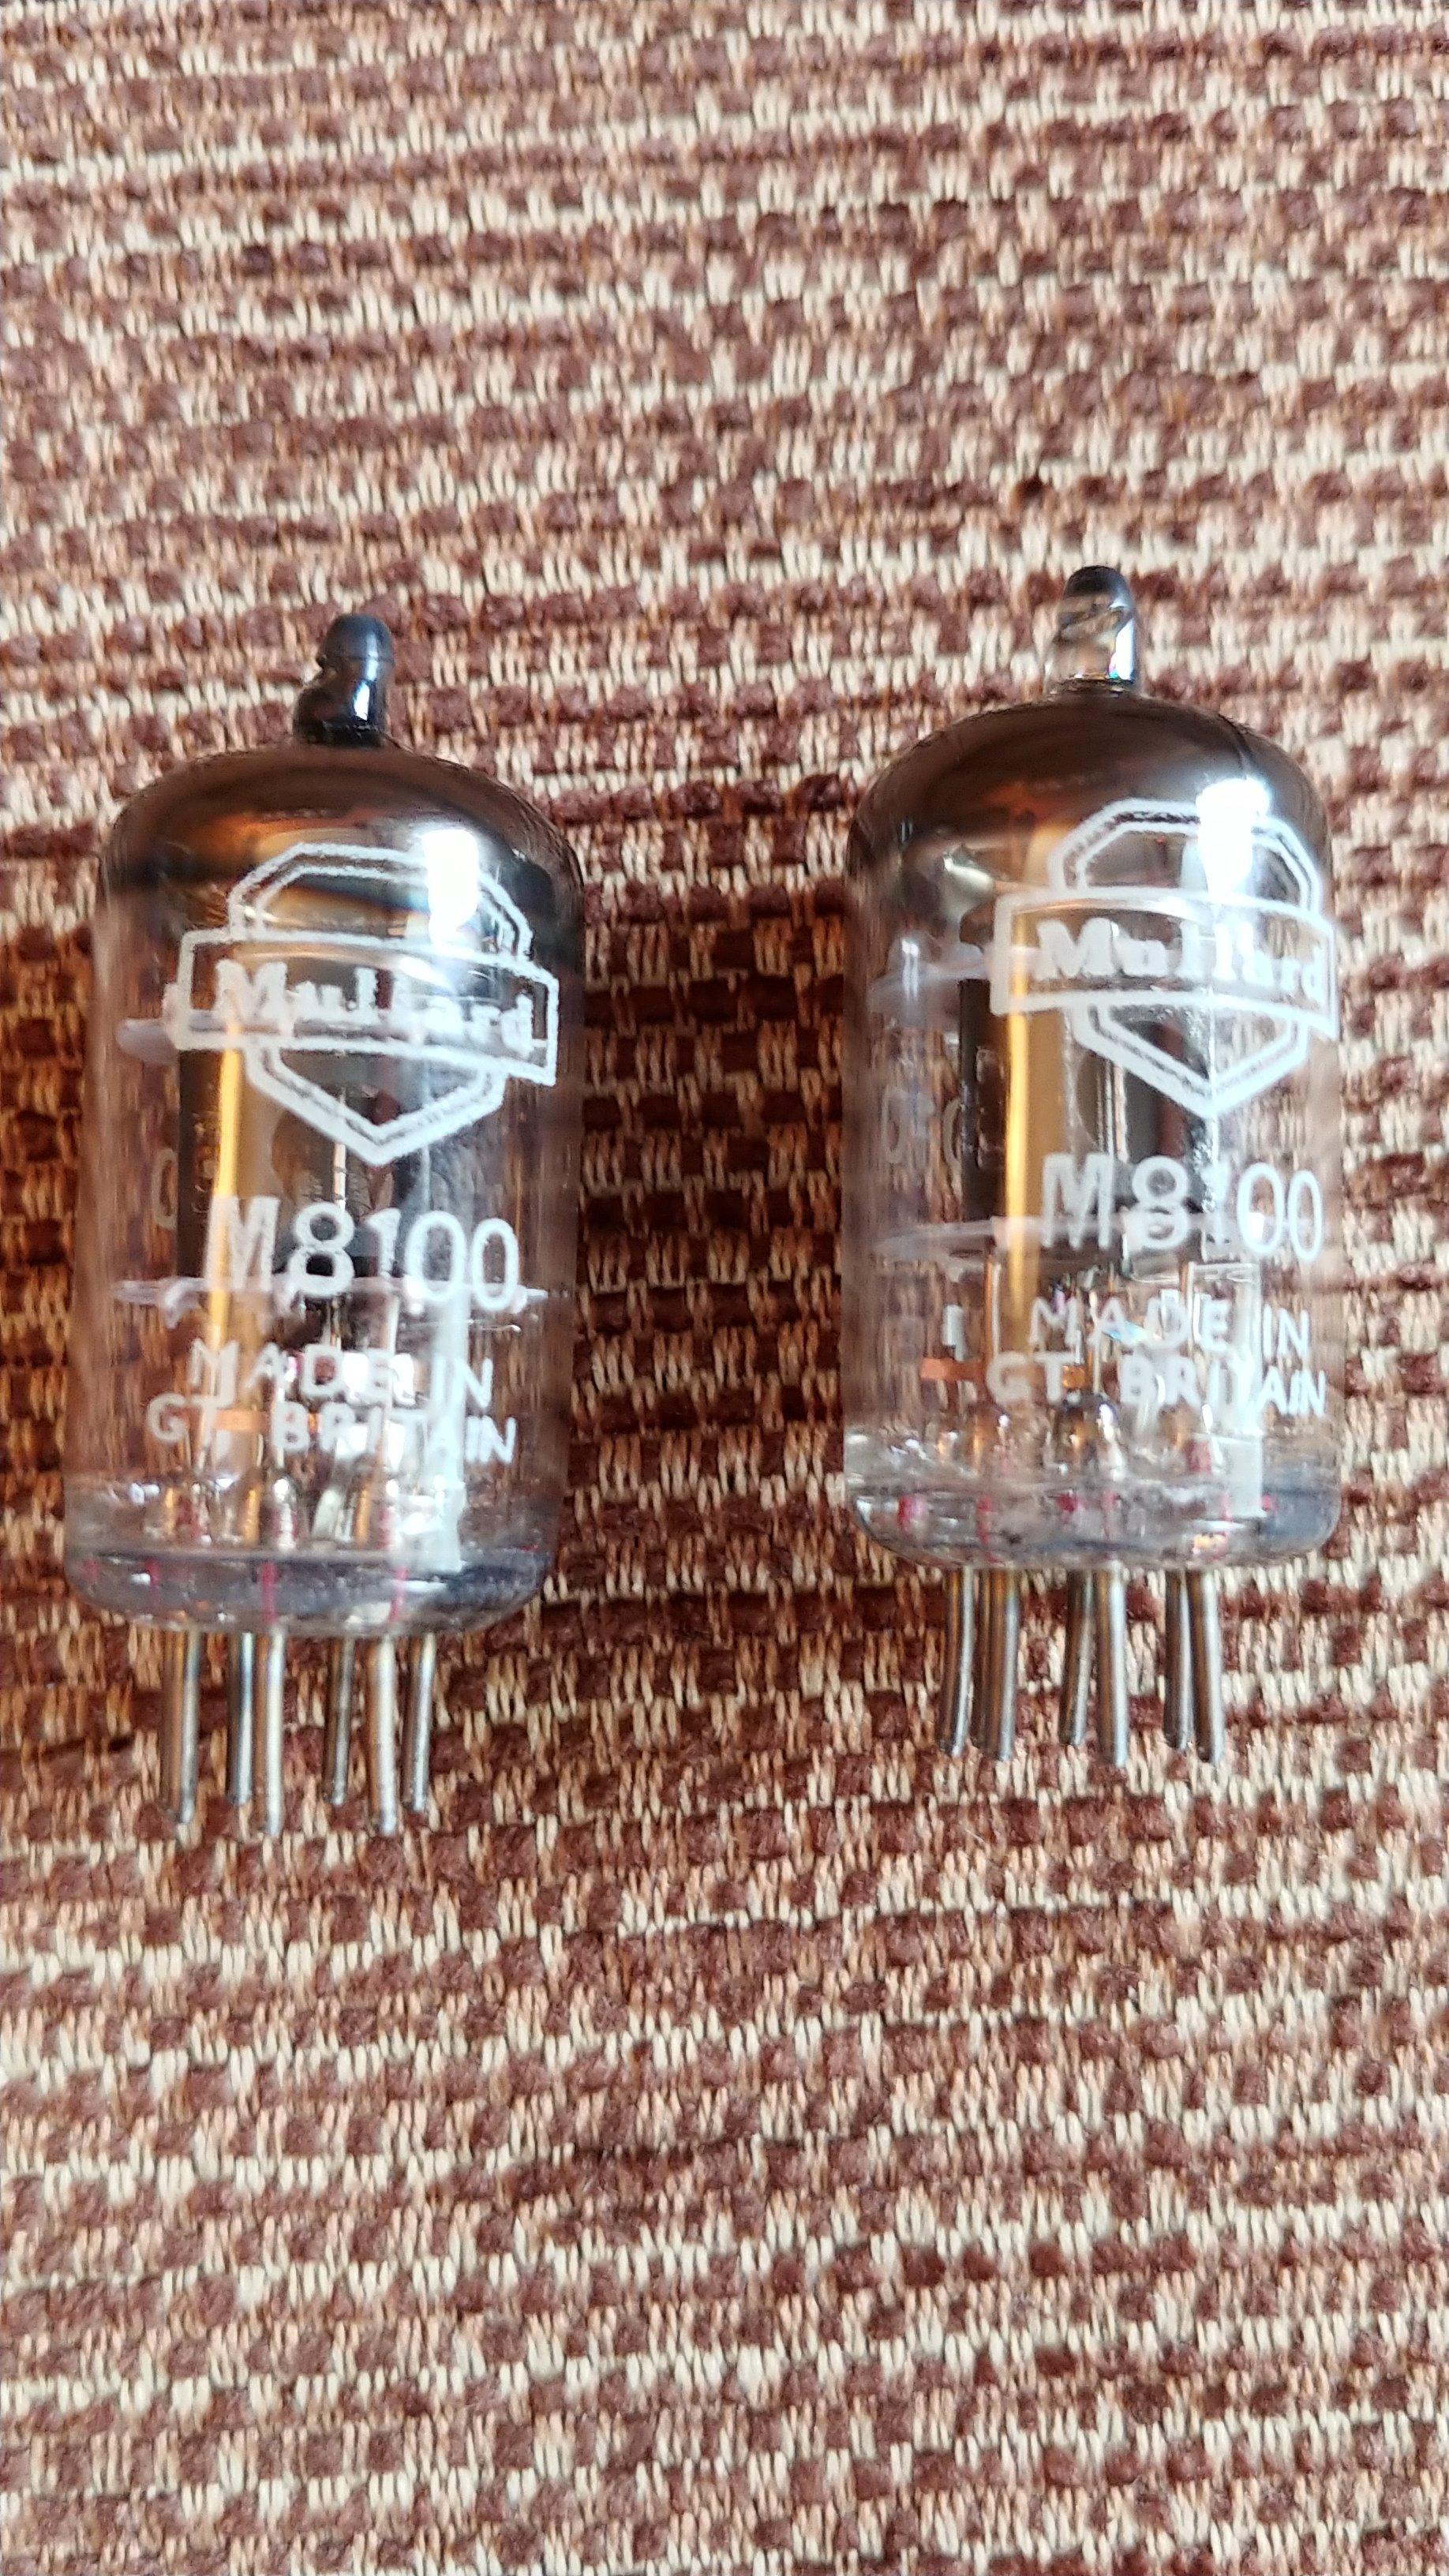 Röhren EM85 // 6DU6 french army Vacuum Tube NIB x1 NOS Valve